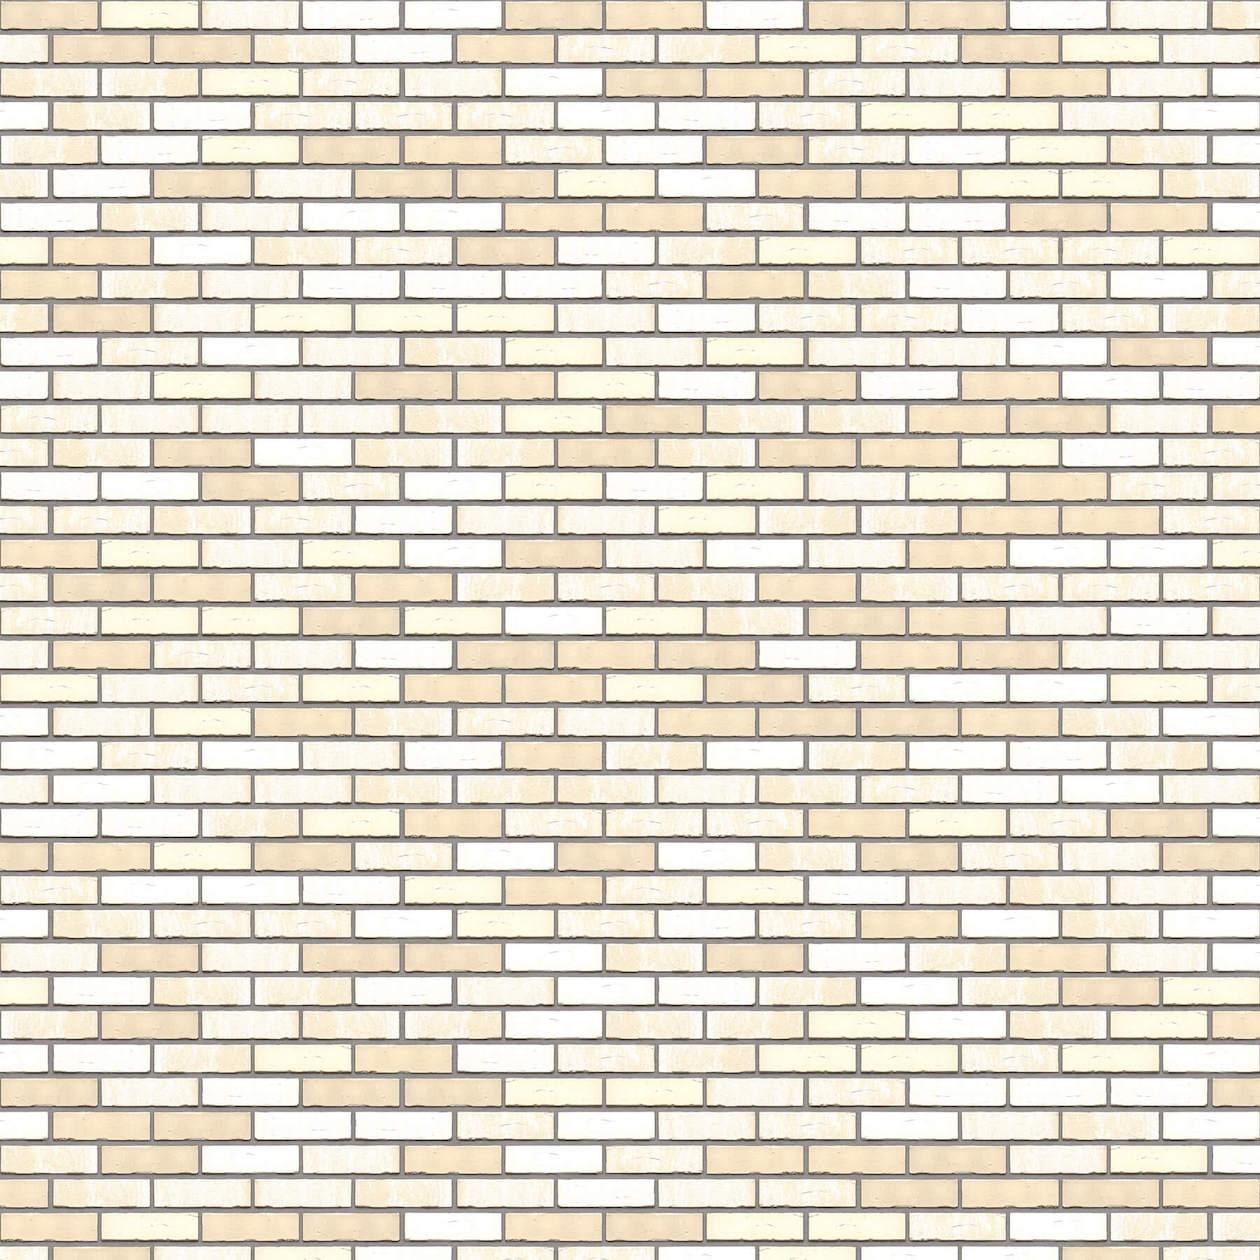 Puna-cigla-FeldHaus-Klinker-brick-house-nf-k-733-Siva Fuga